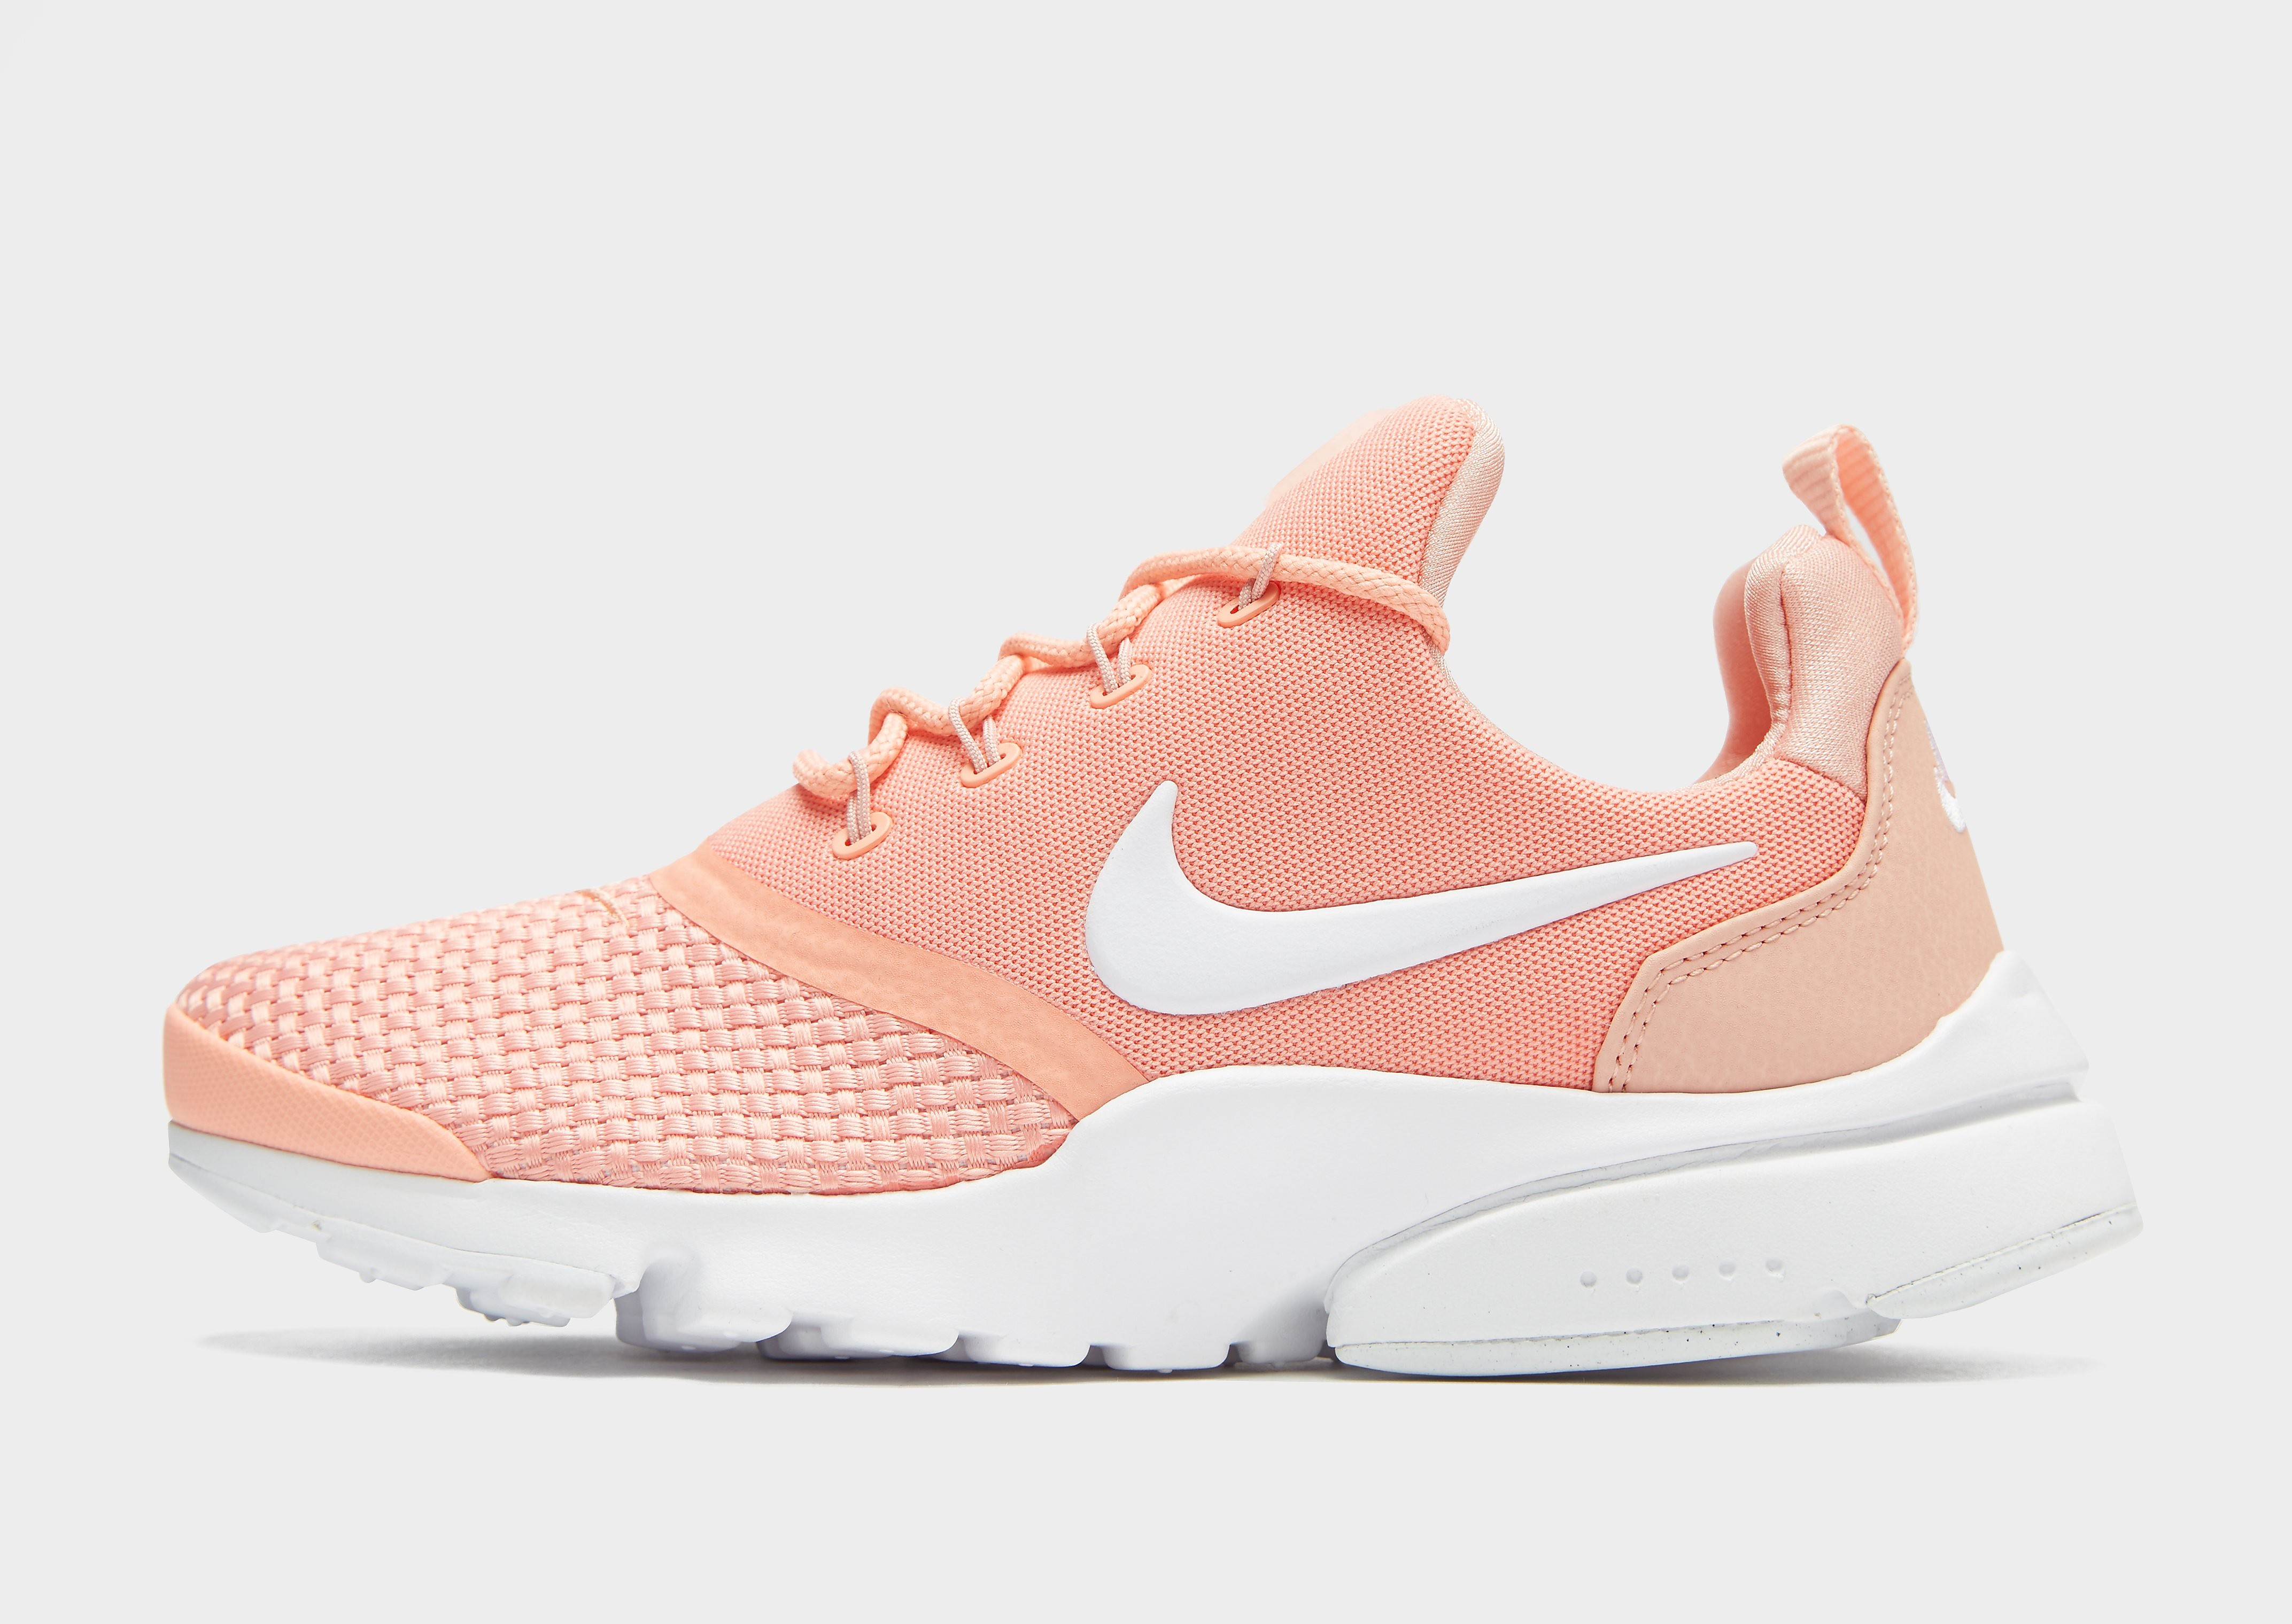 Nike Air Presto Fly Woven Women's